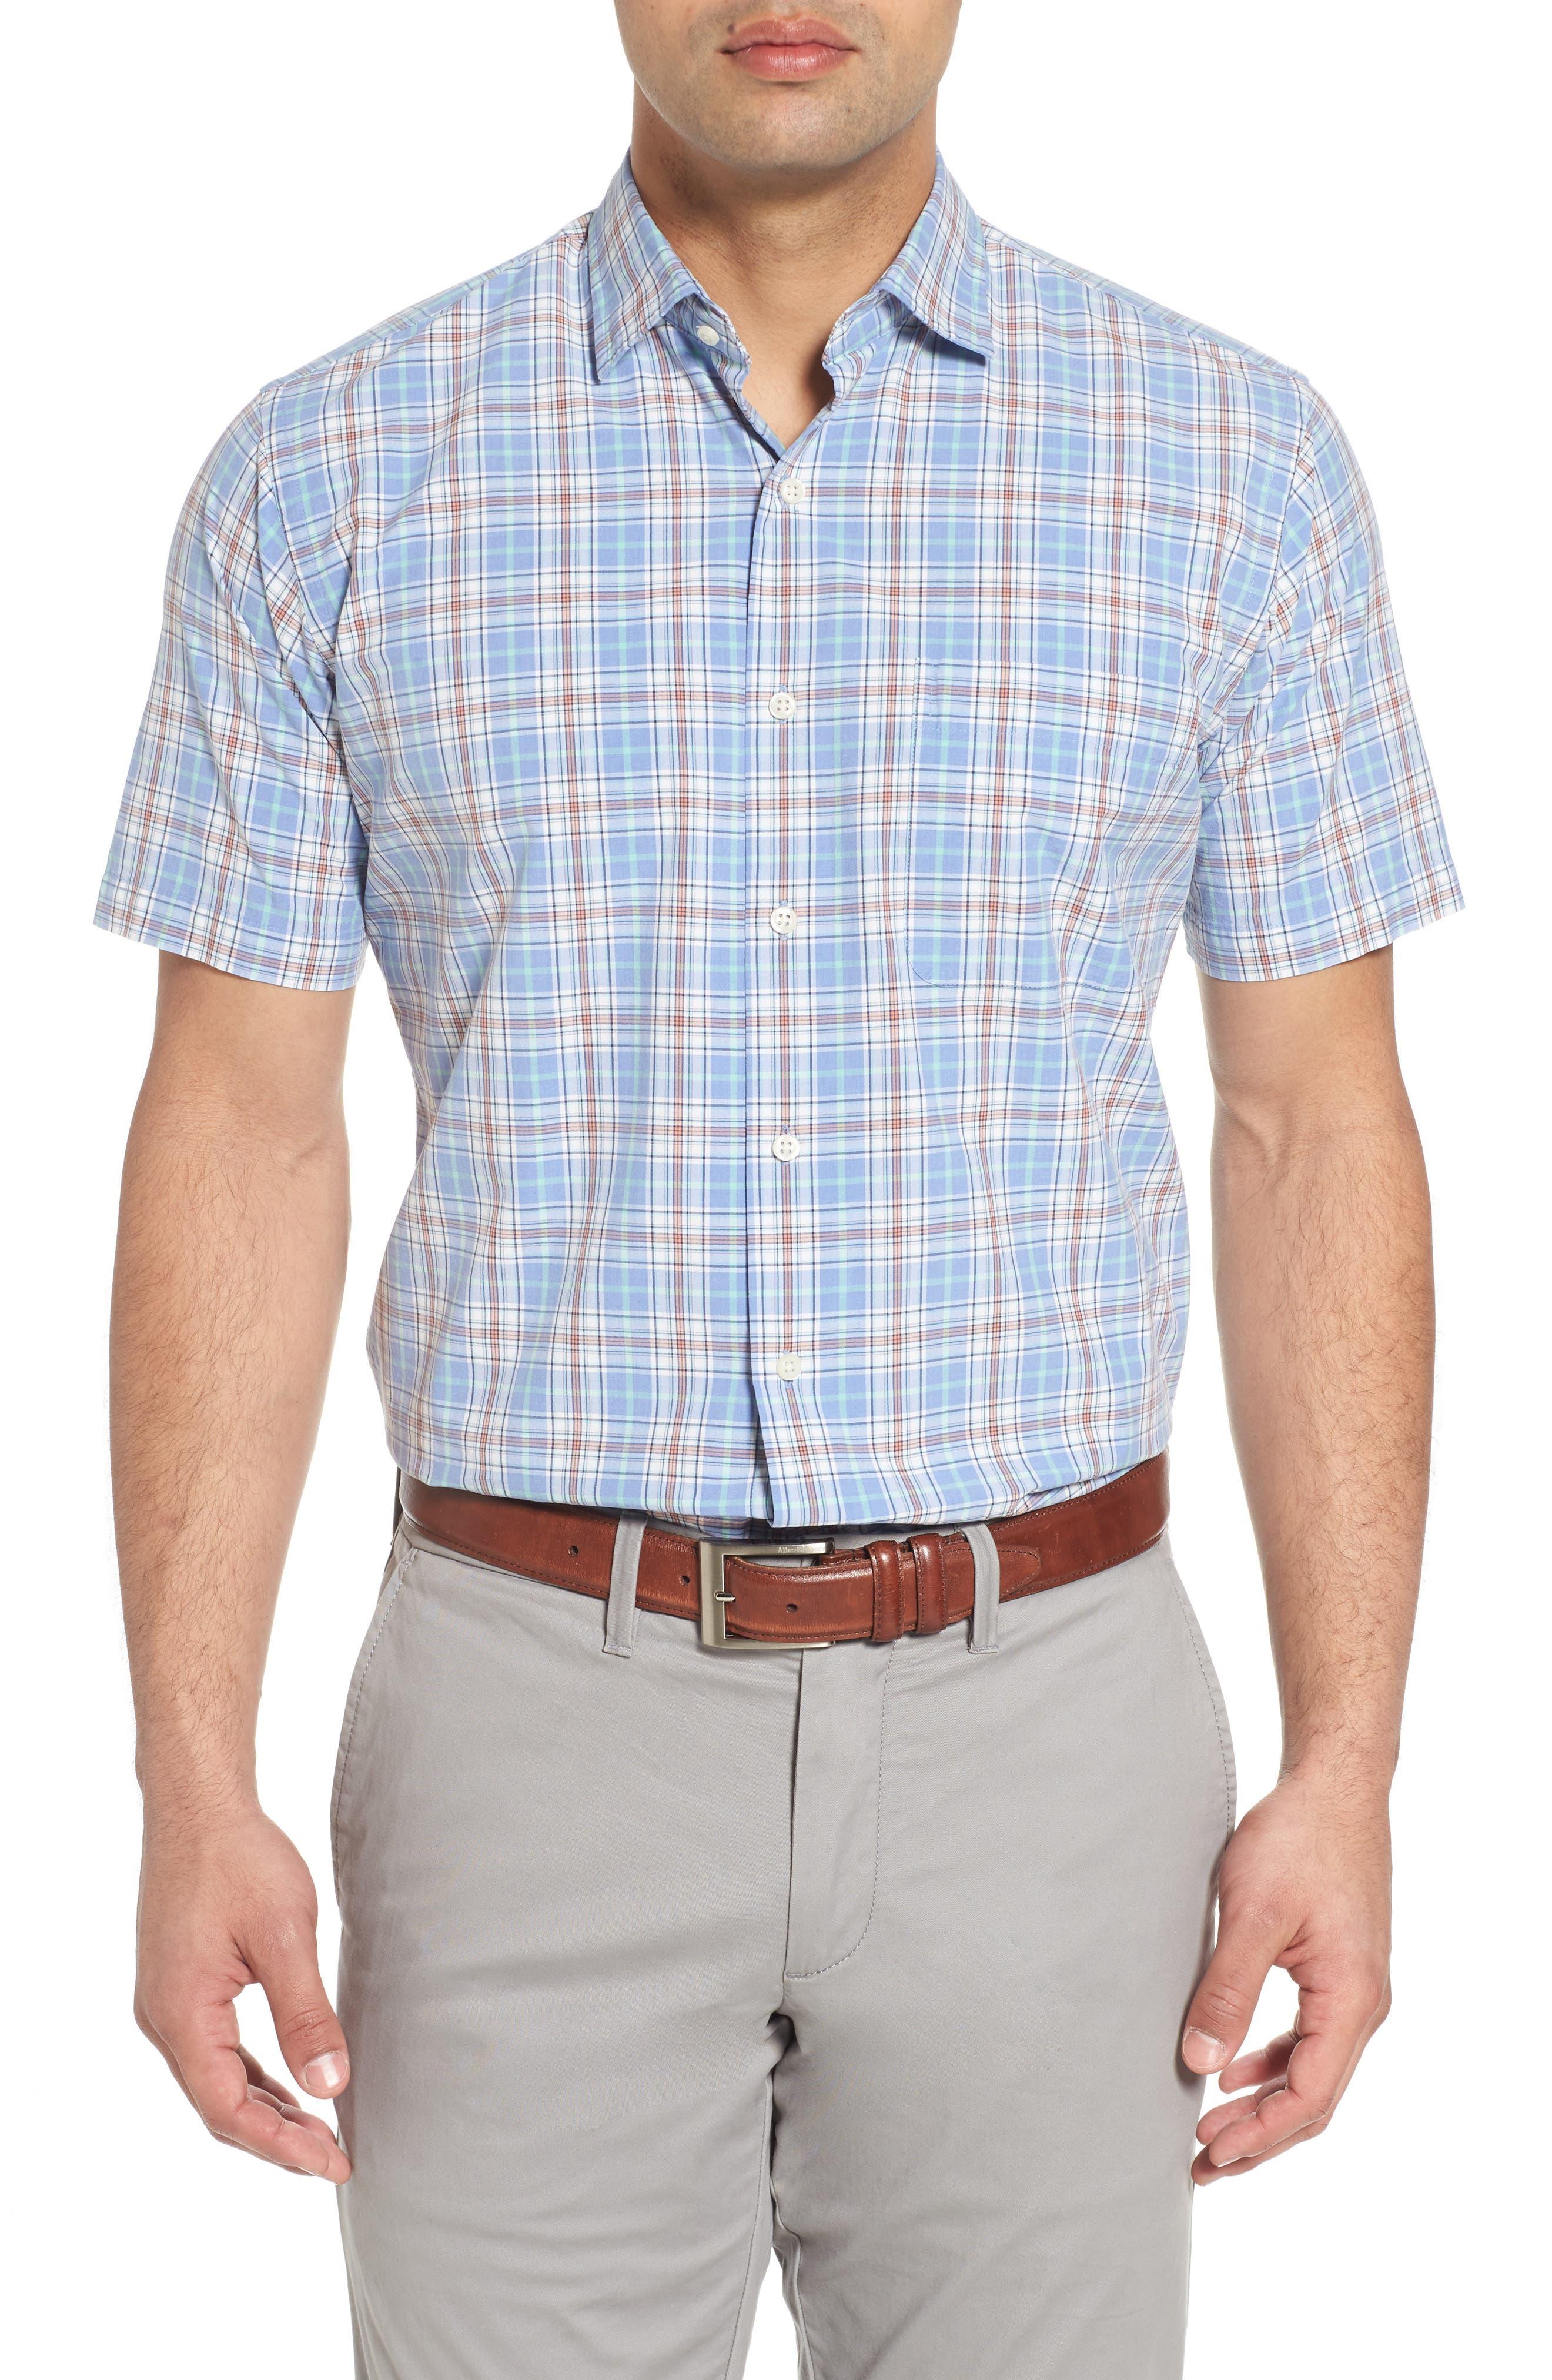 Rockport Plaid Sport Shirt,                             Main thumbnail 1, color,                             407